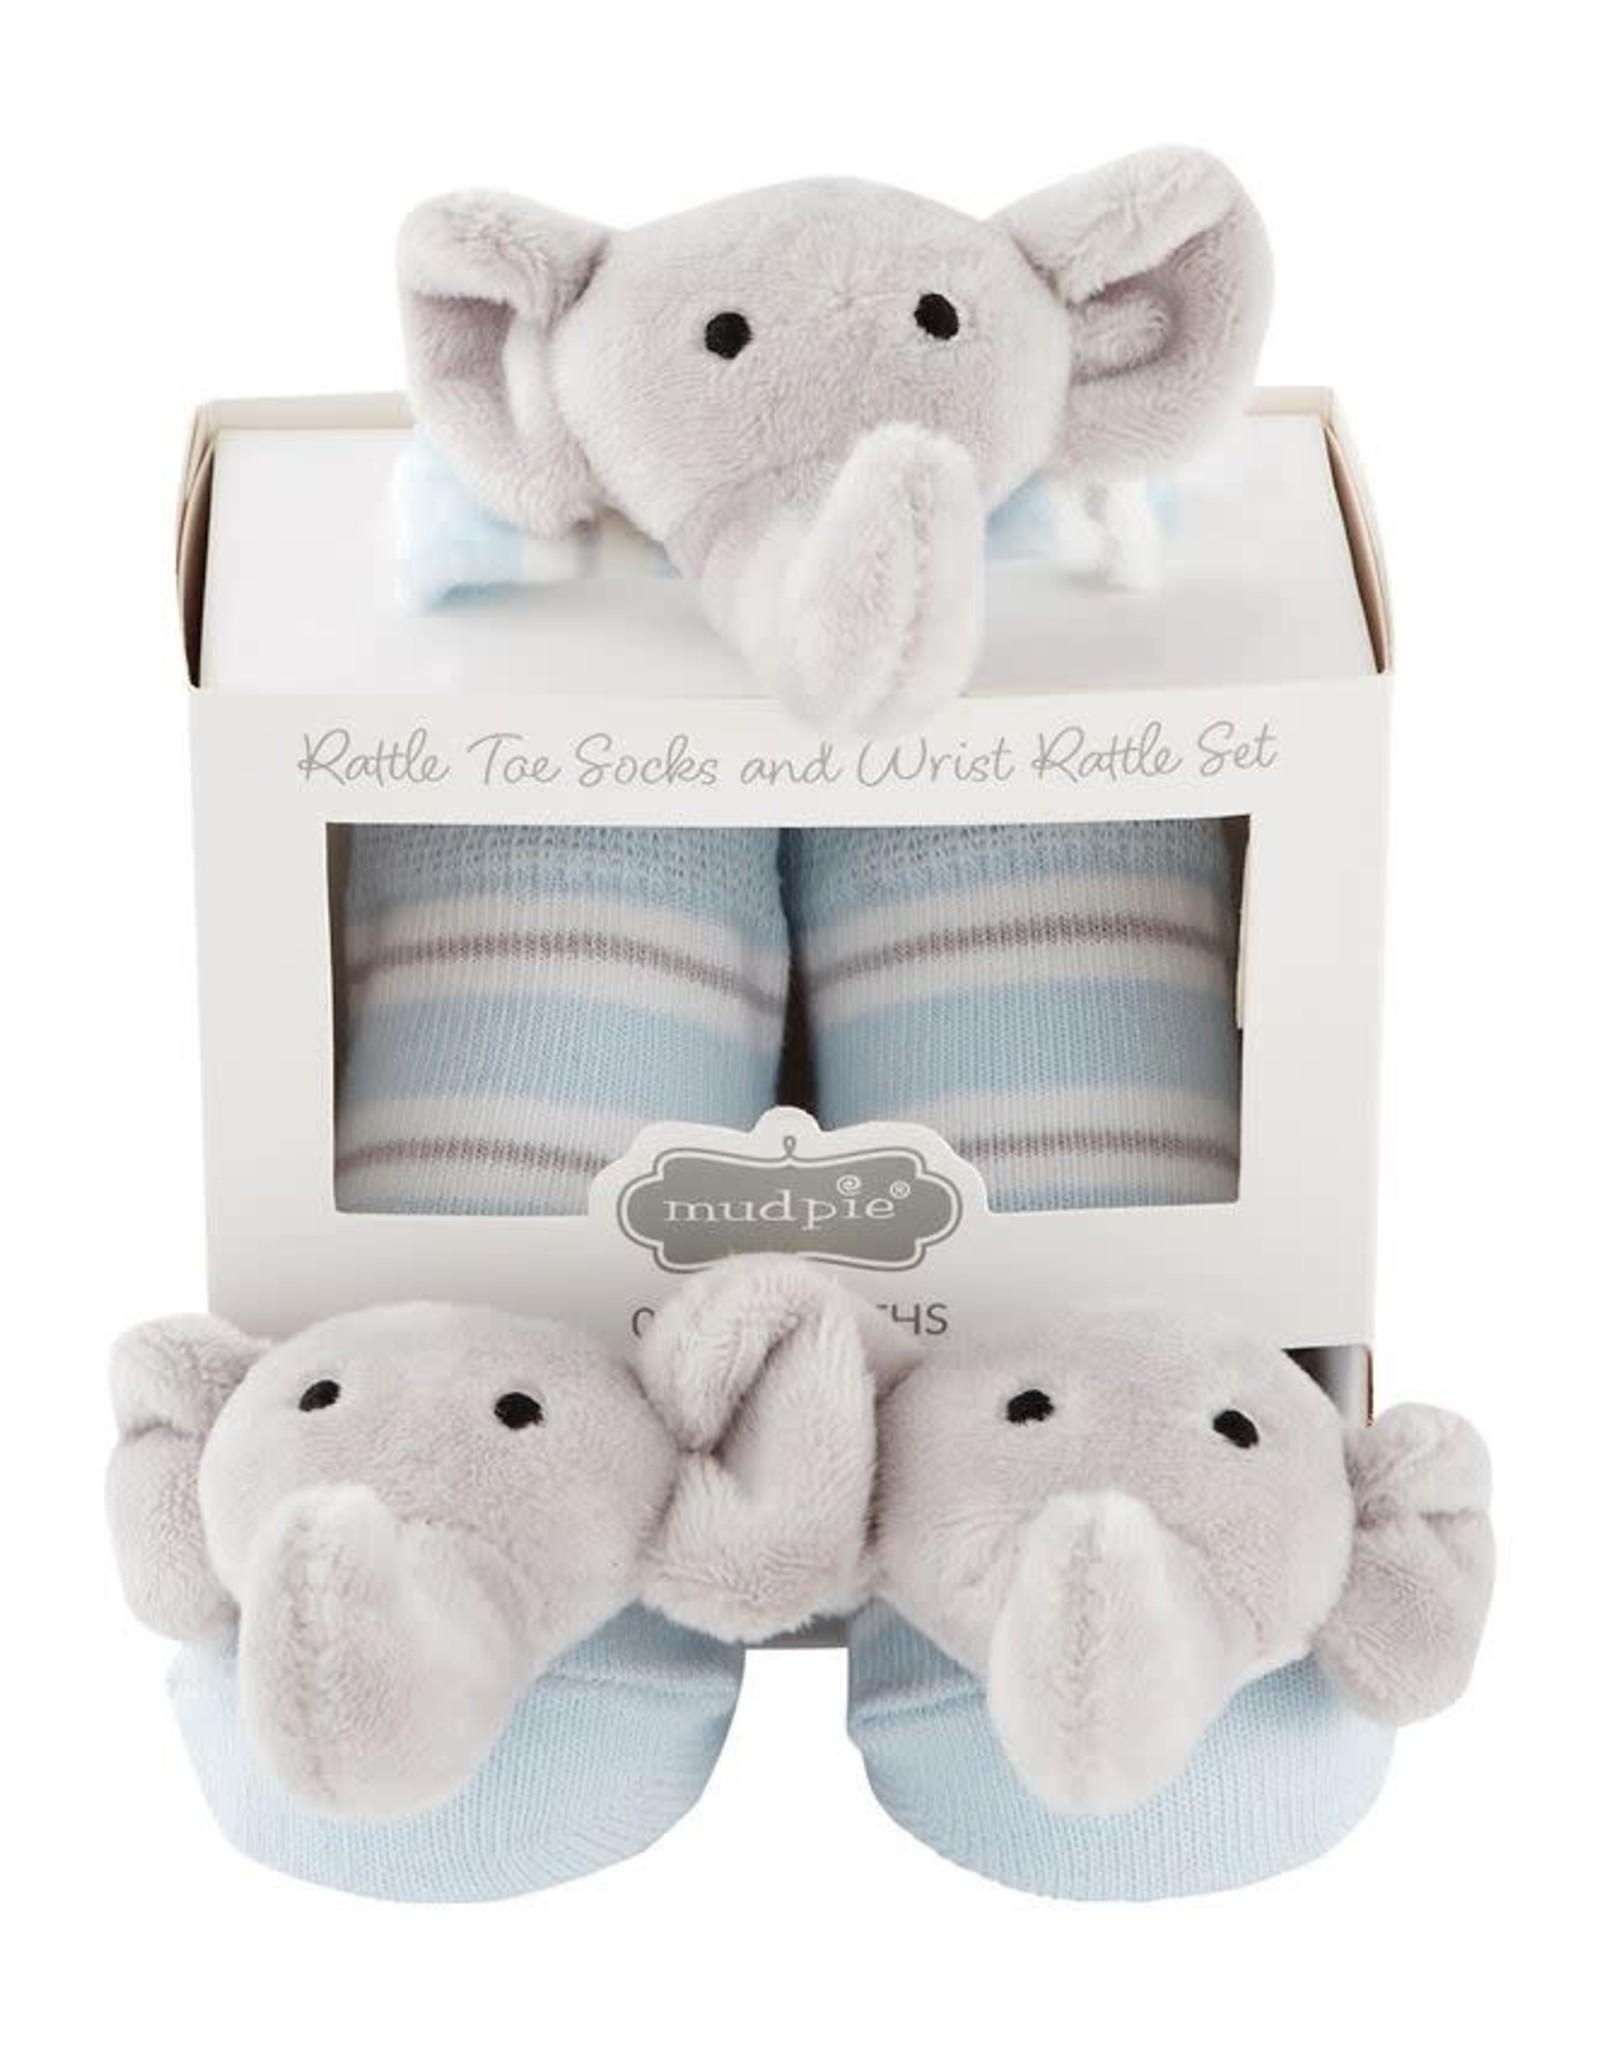 Elephant Wrist Rattle Socks